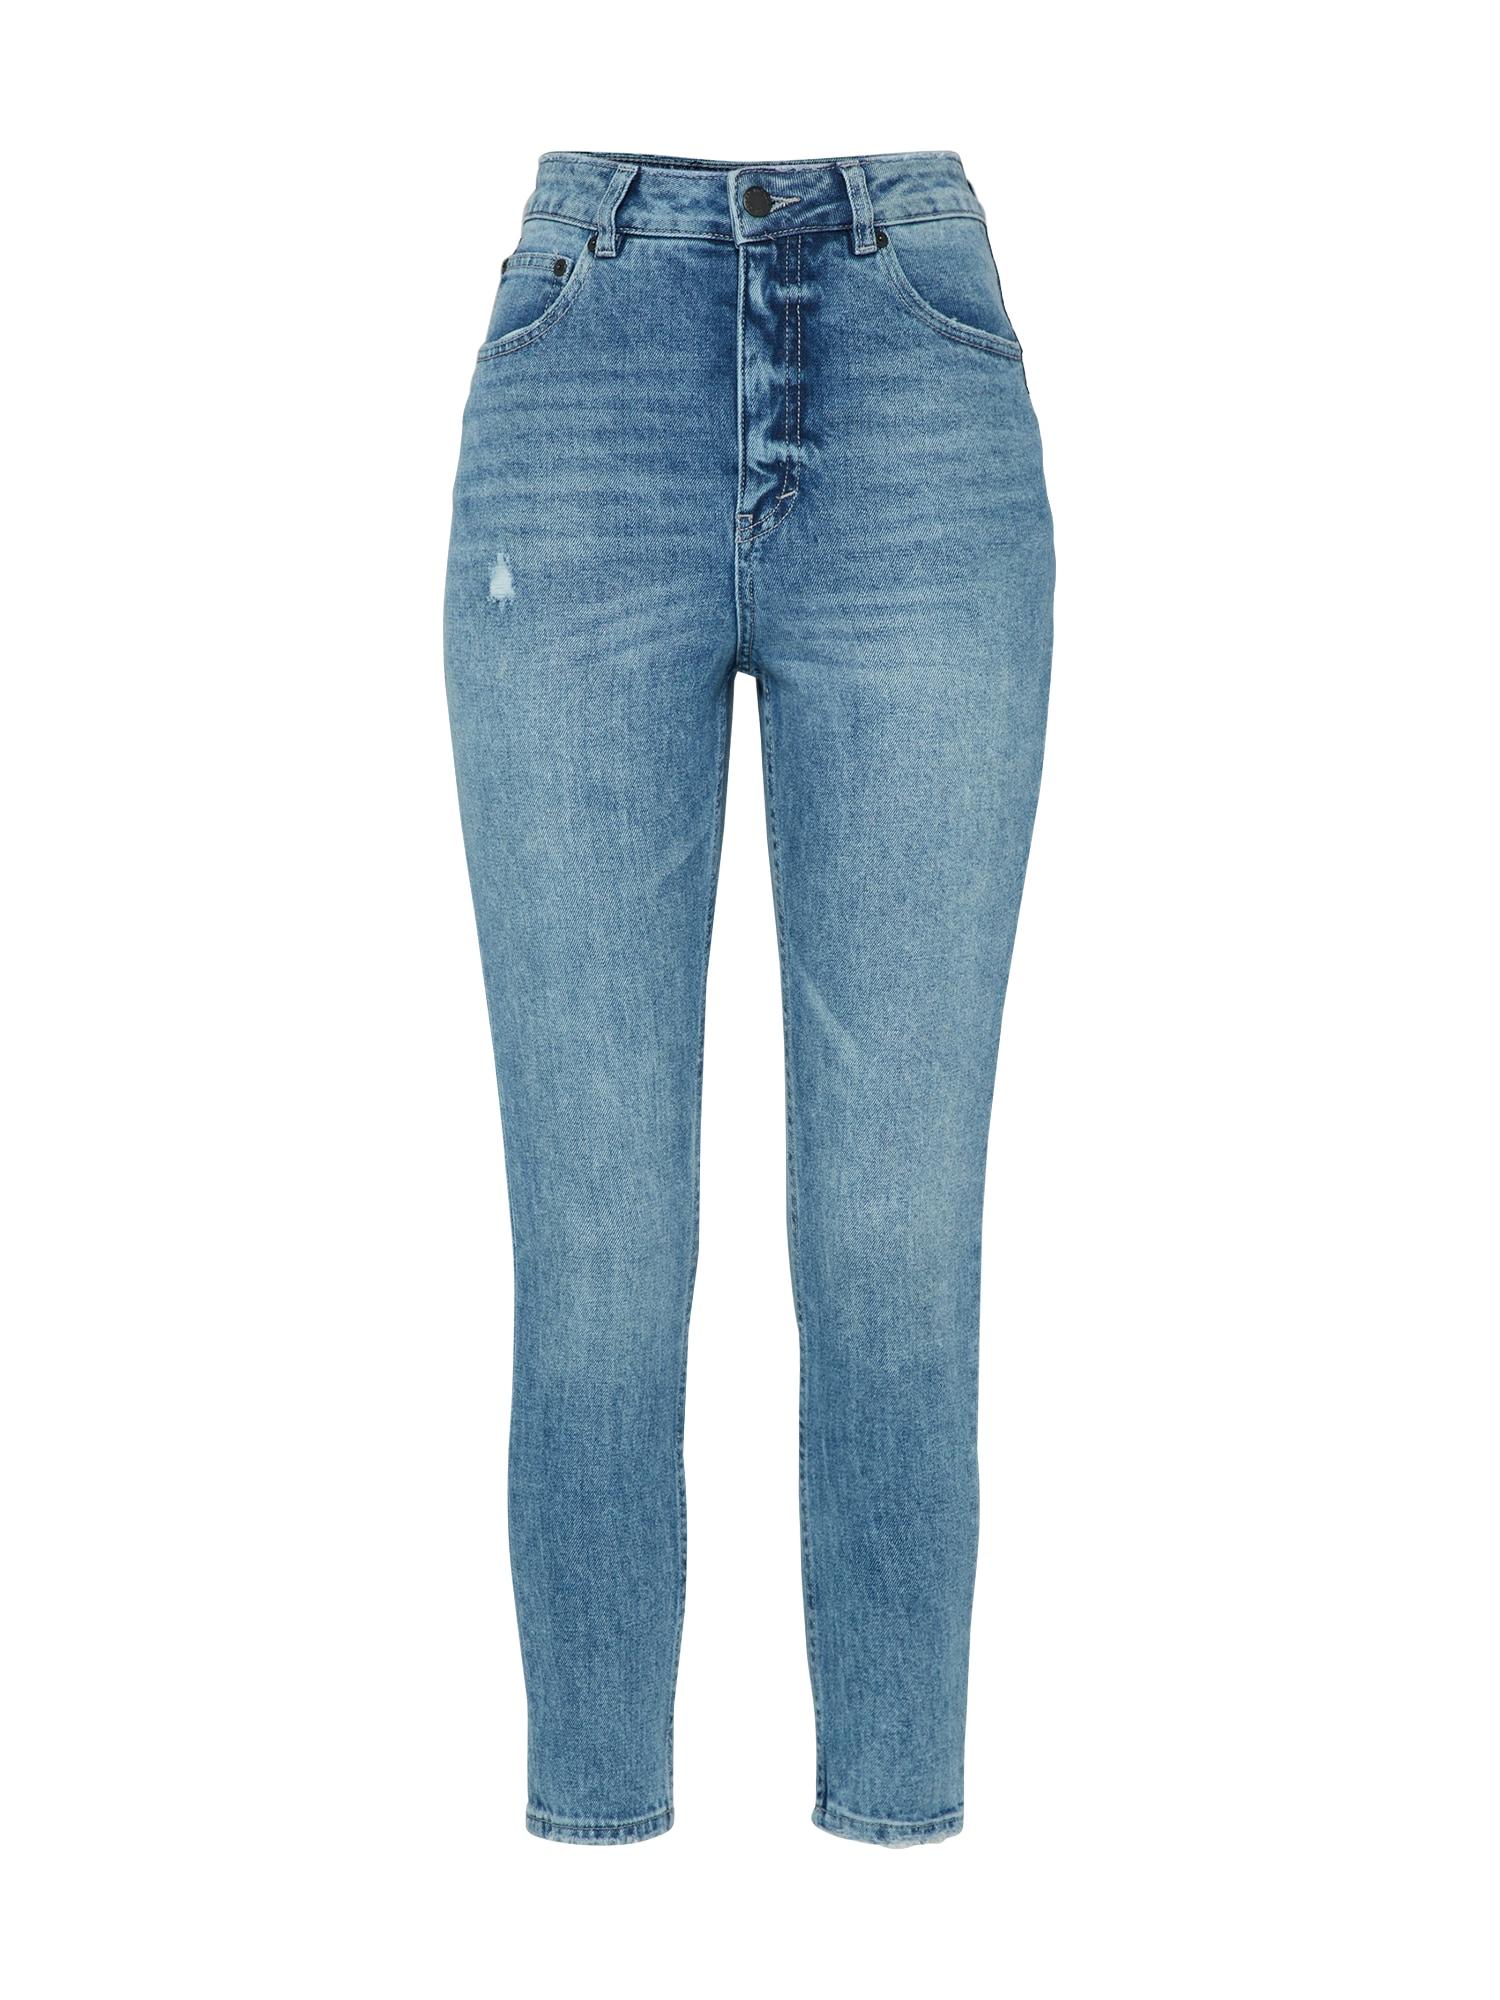 CHEAP MONDAY Dames Jeans Donna blauw